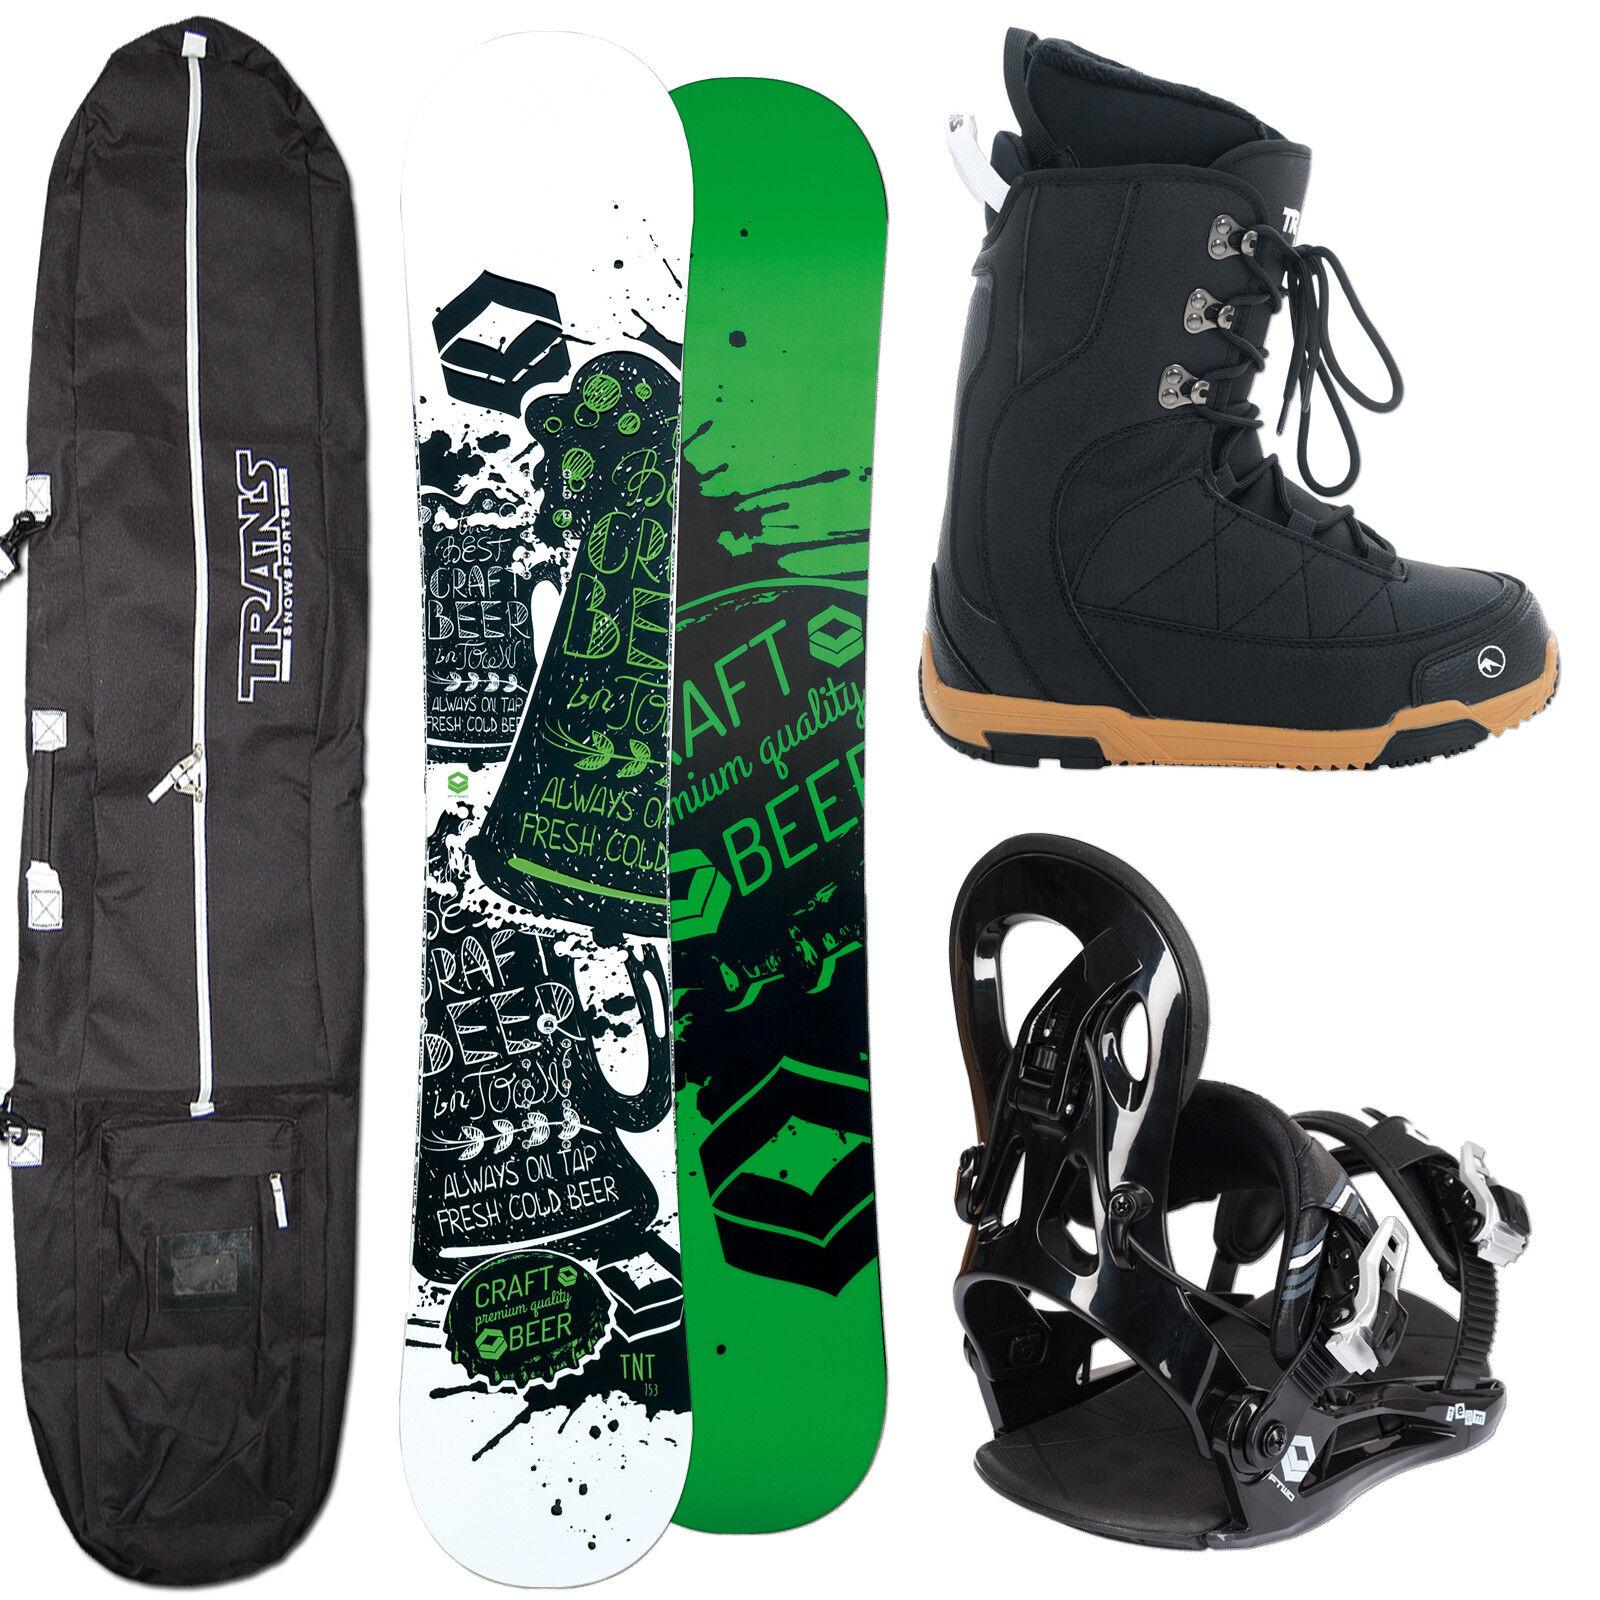 Men's Snowboard Ftwo Tnt Green 146 cm + Fastec Binding SIZE M + Boots+ Bag